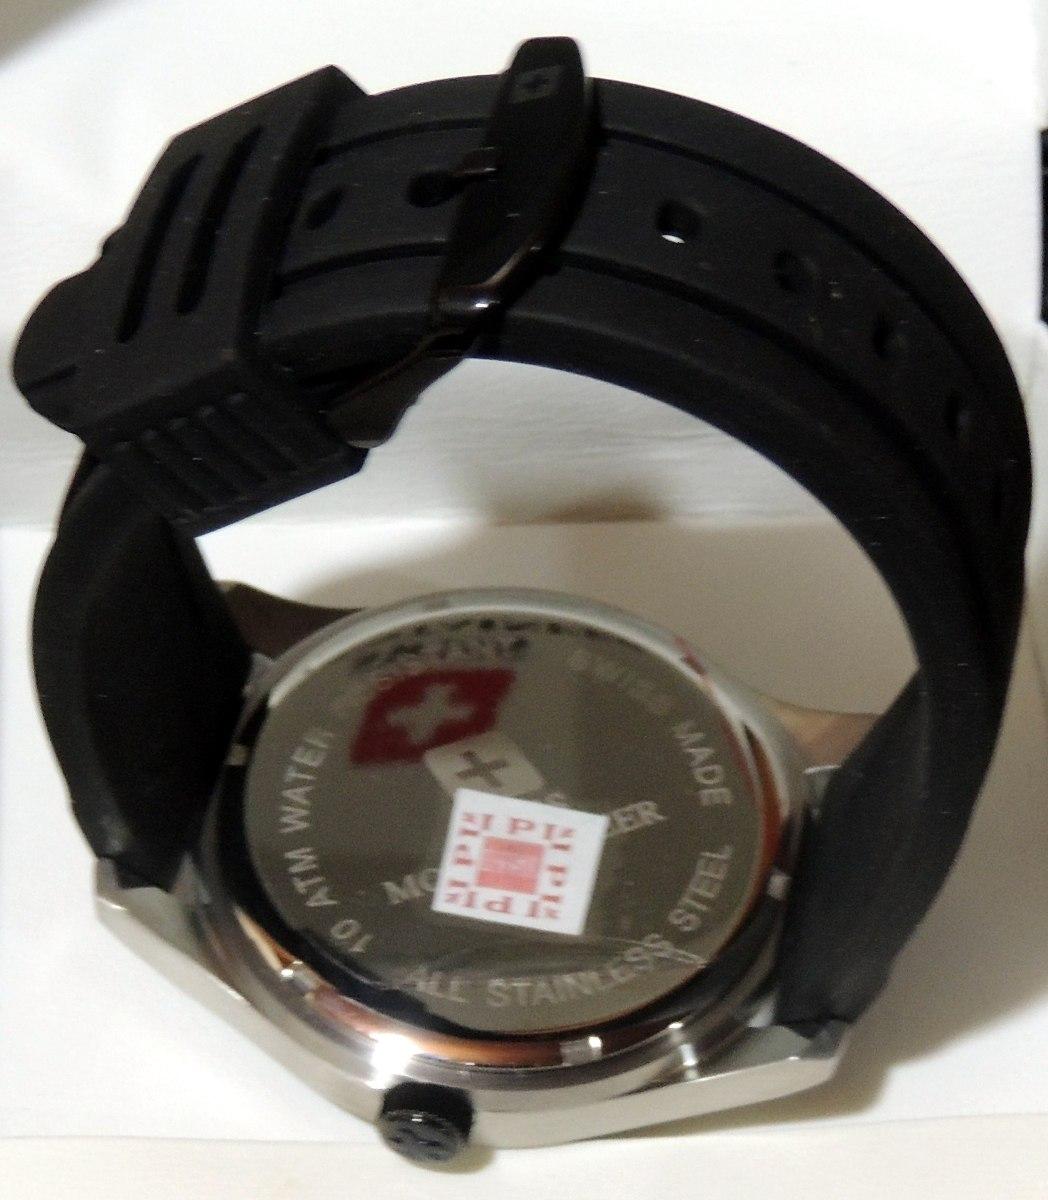 1a4459e14 Relogio Suiço Watch - Swiss Mountaineer - Sml8042 - 48mm - R  380